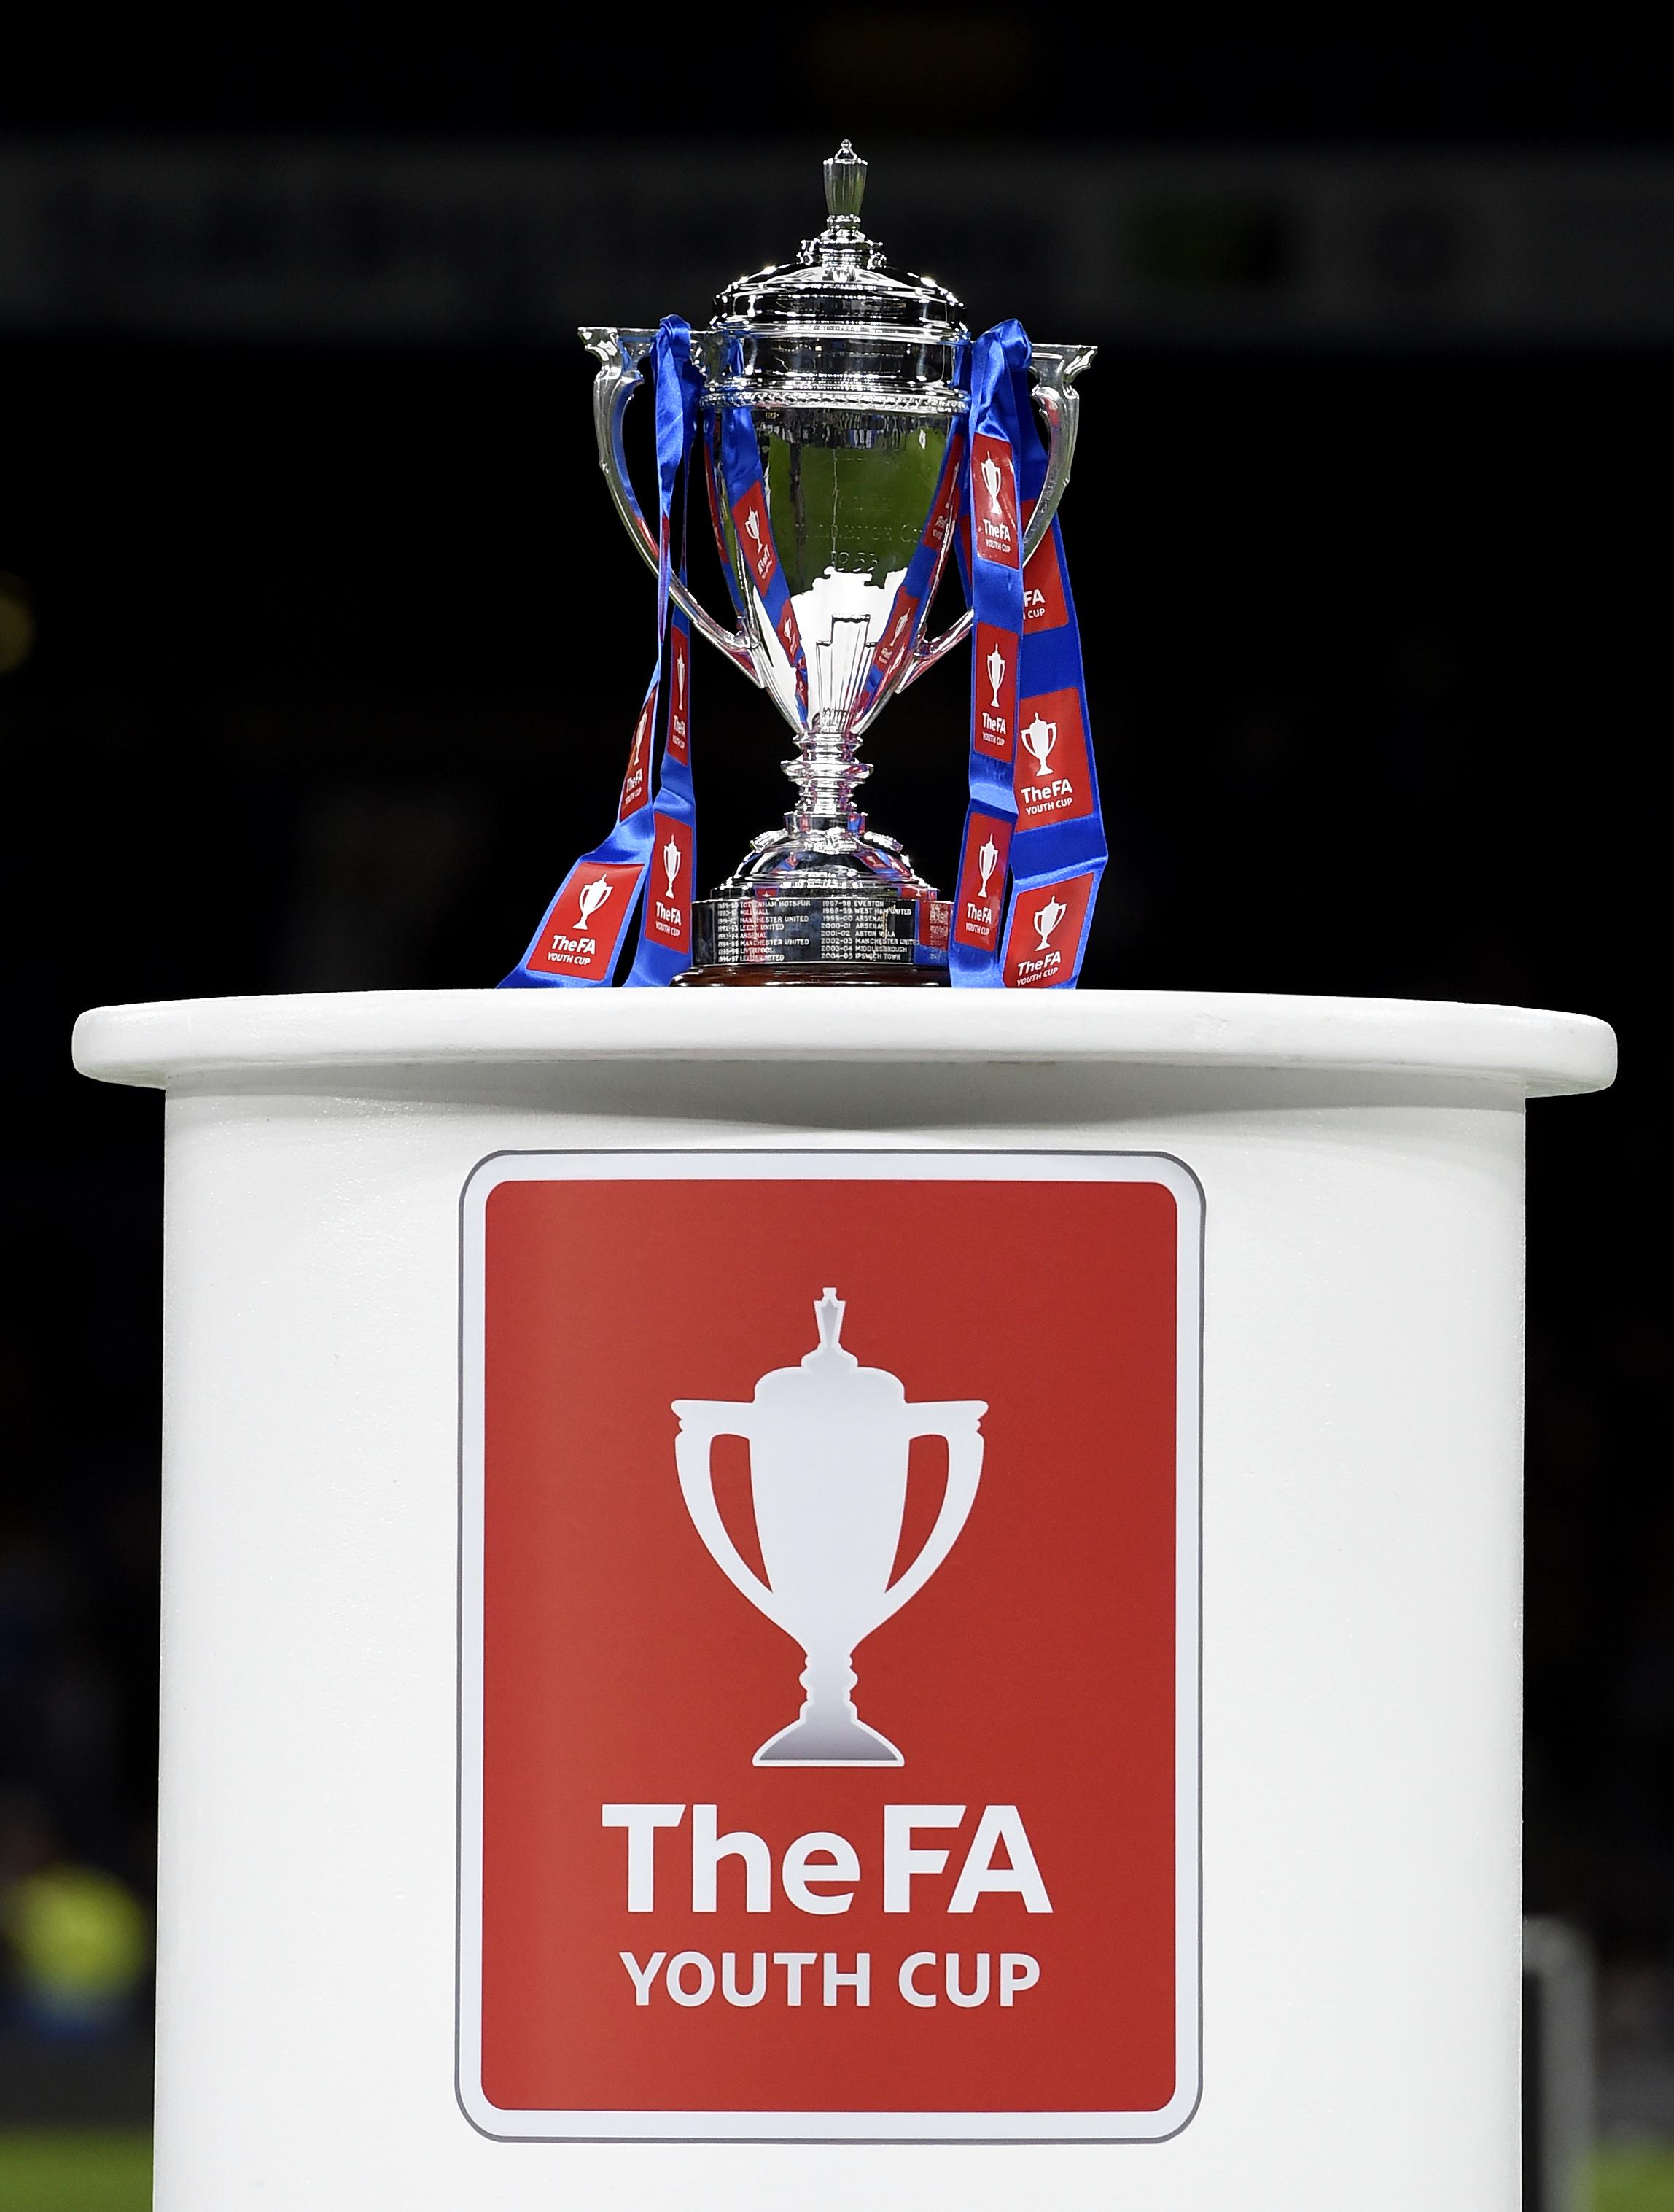 Southampton cruise to FA Youth Cup win